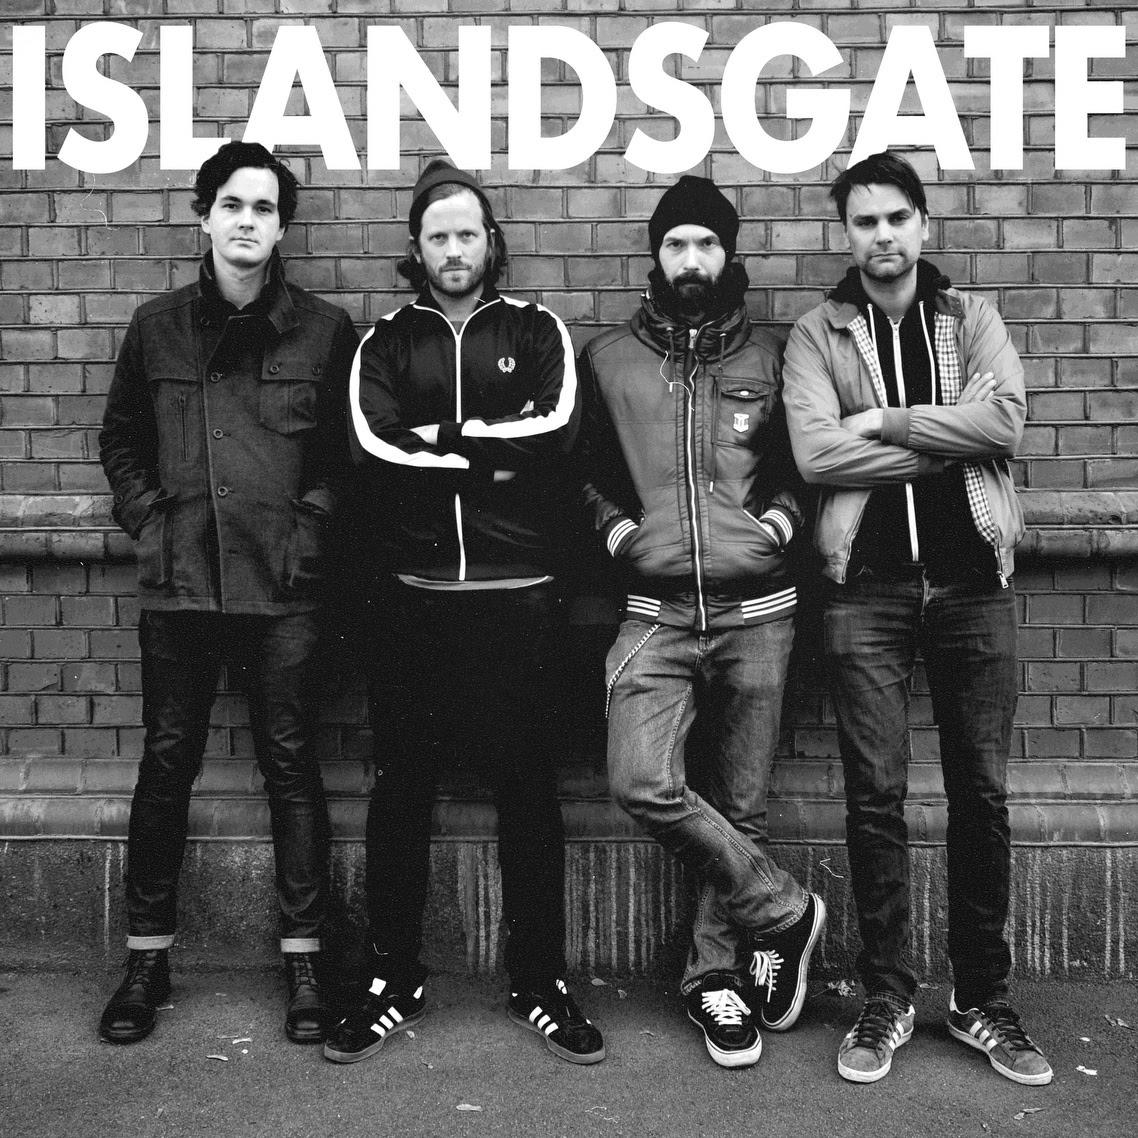 Islandsgate 1